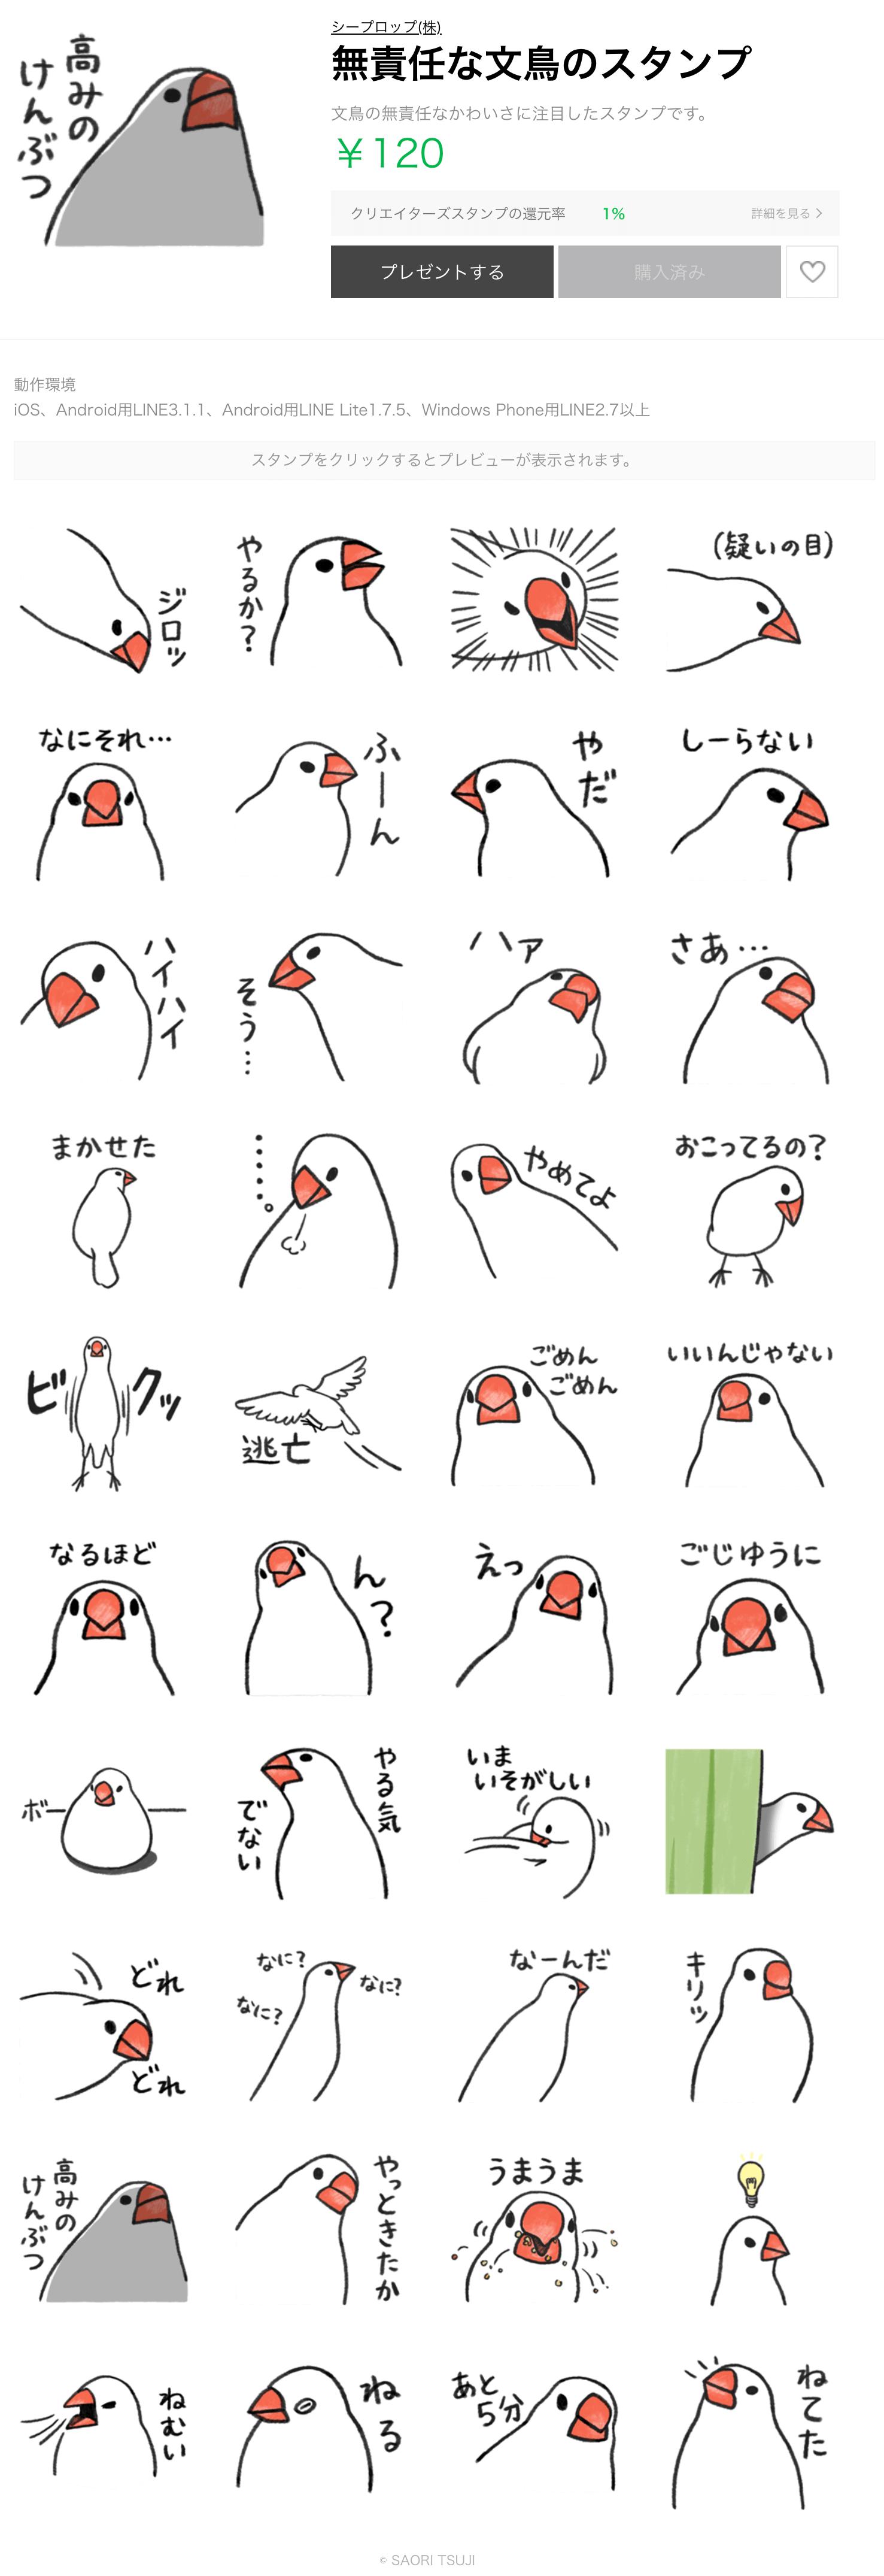 LINEスタンプ(無責任な文鳥のスタンプ)